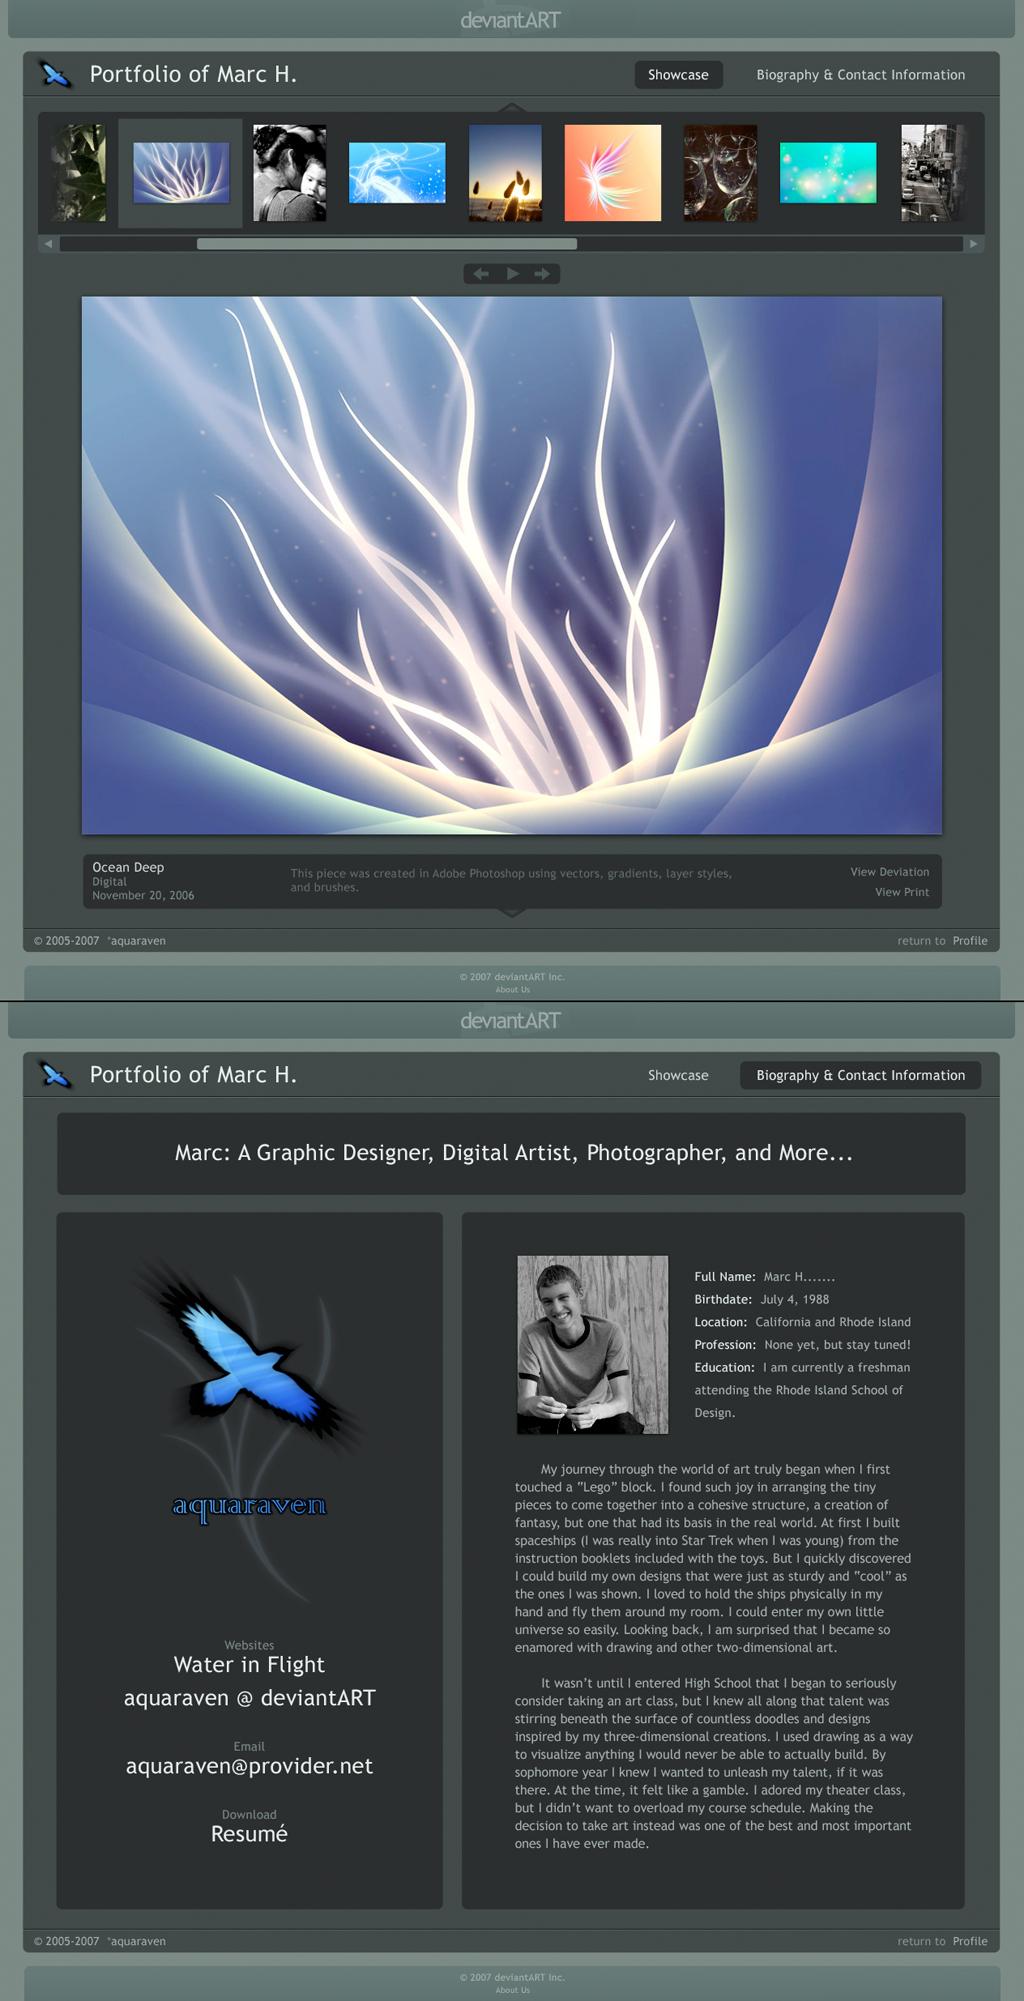 Aquaraven's Portfolio Design by aquaraven